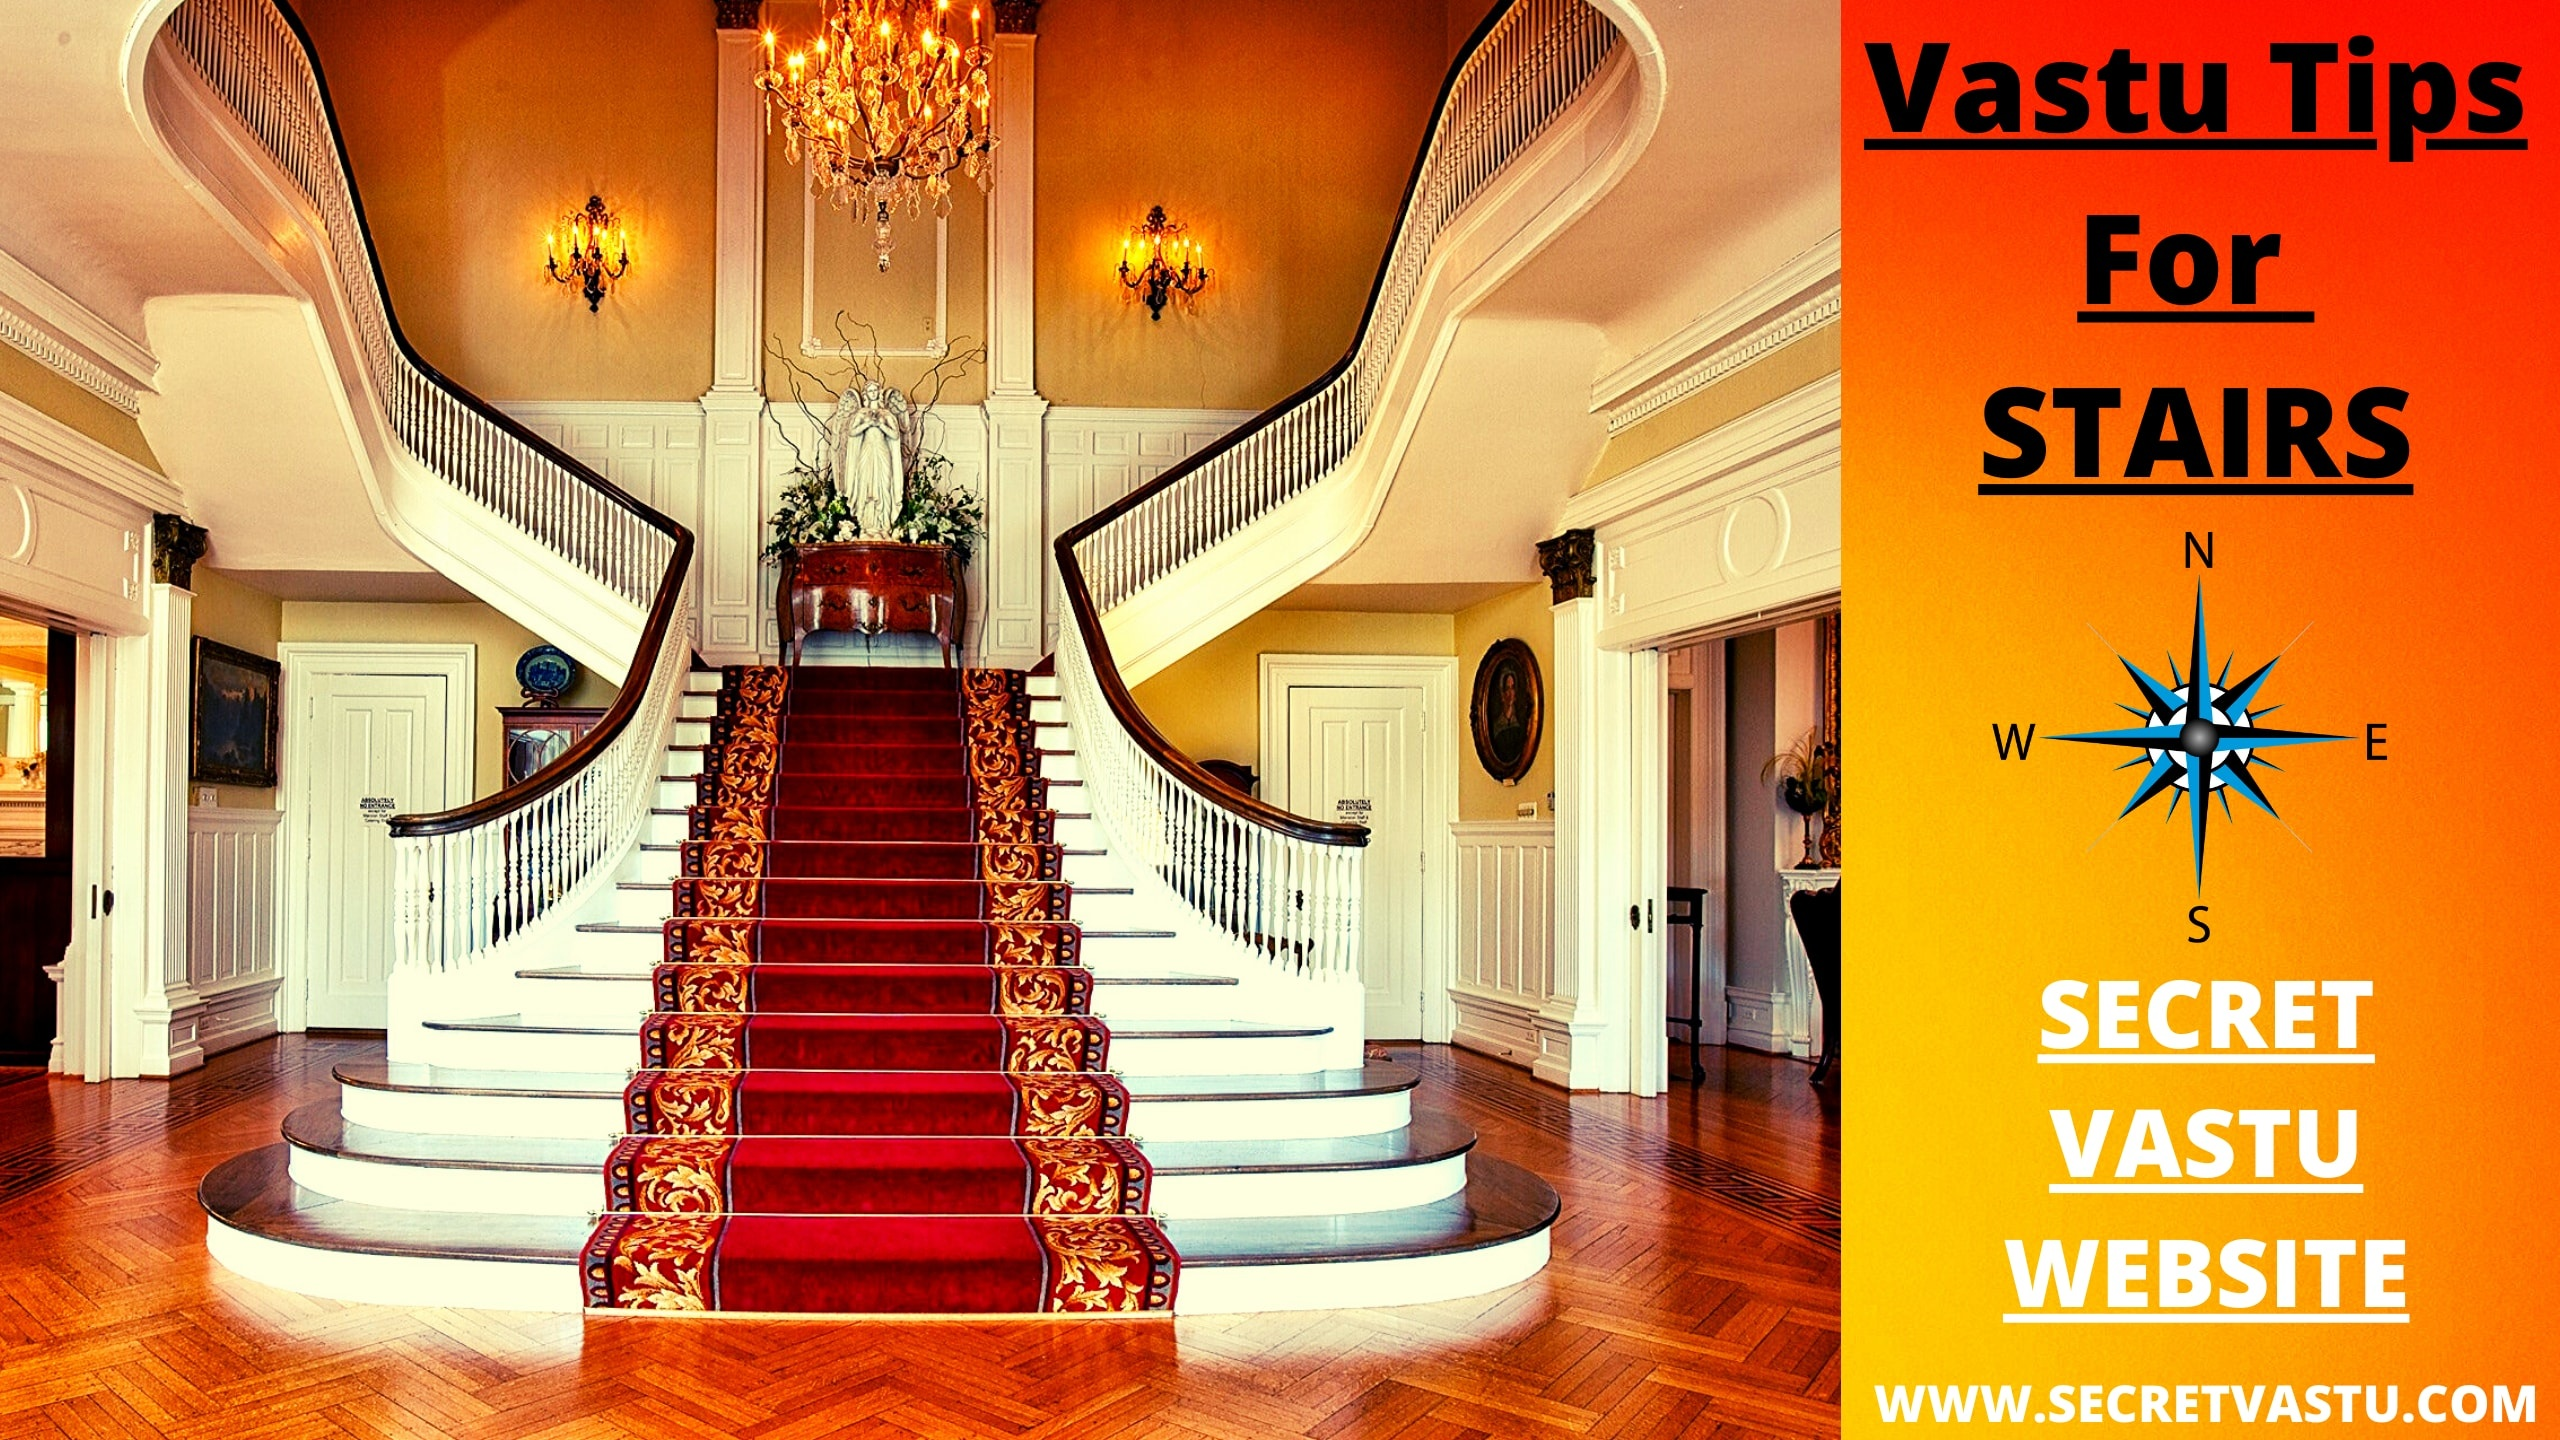 Vastu Tips For Stairs